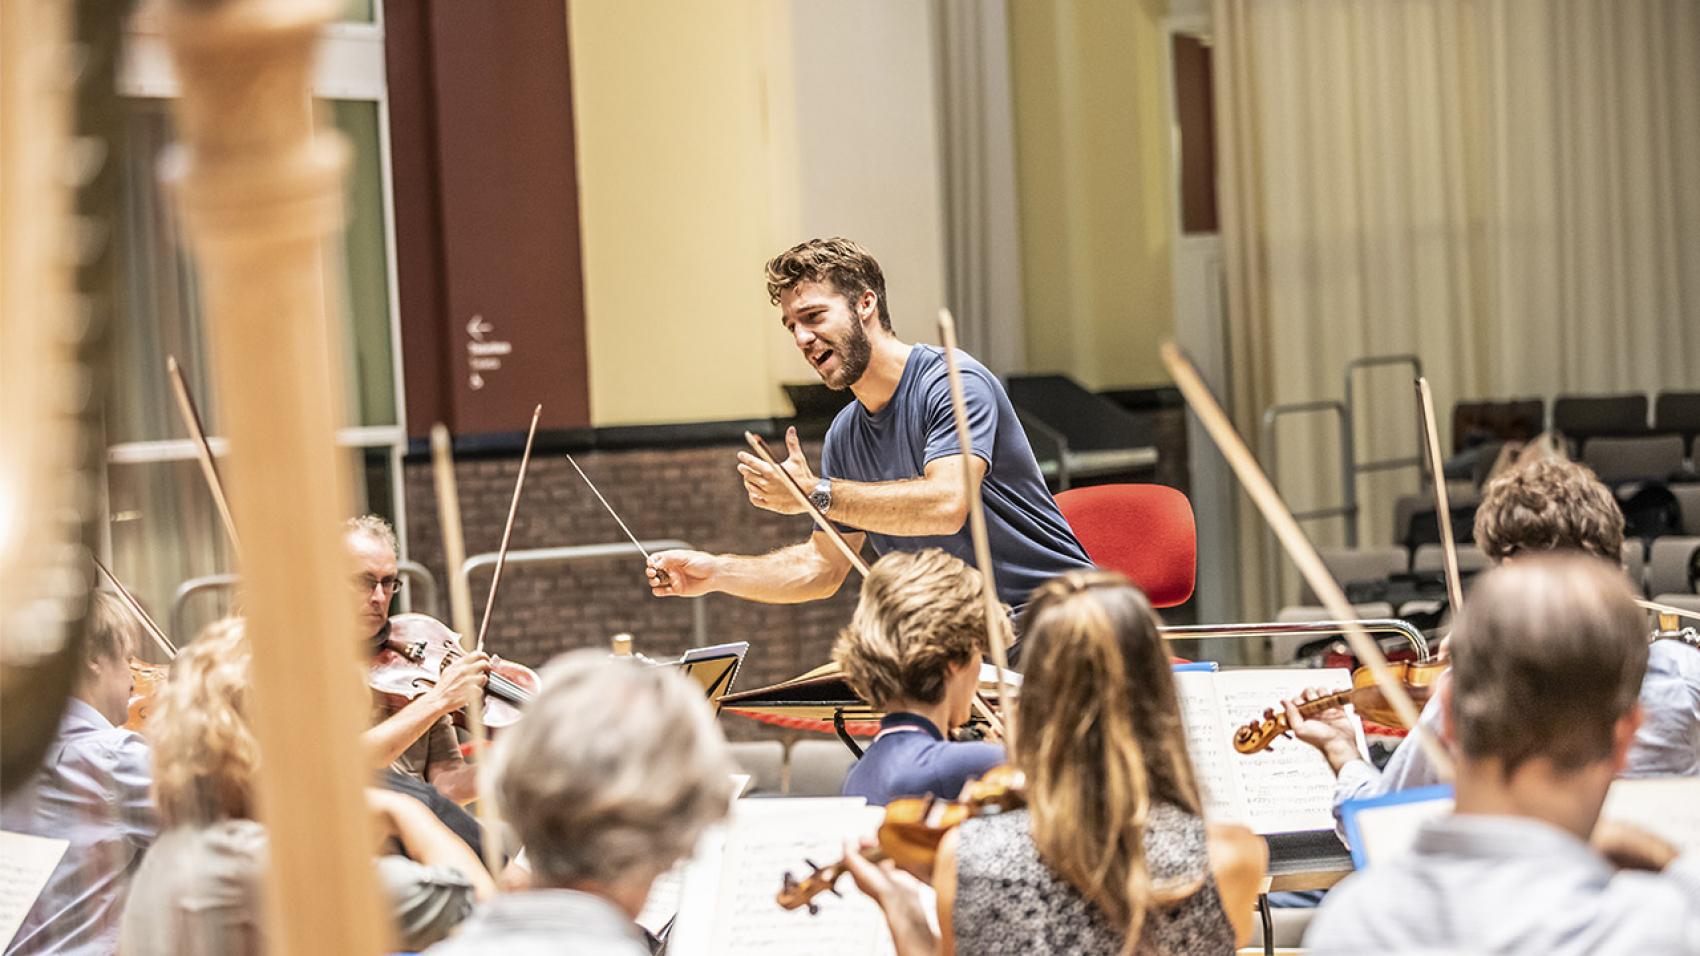 Openbare repetitie: Elgar en Mendelssohn